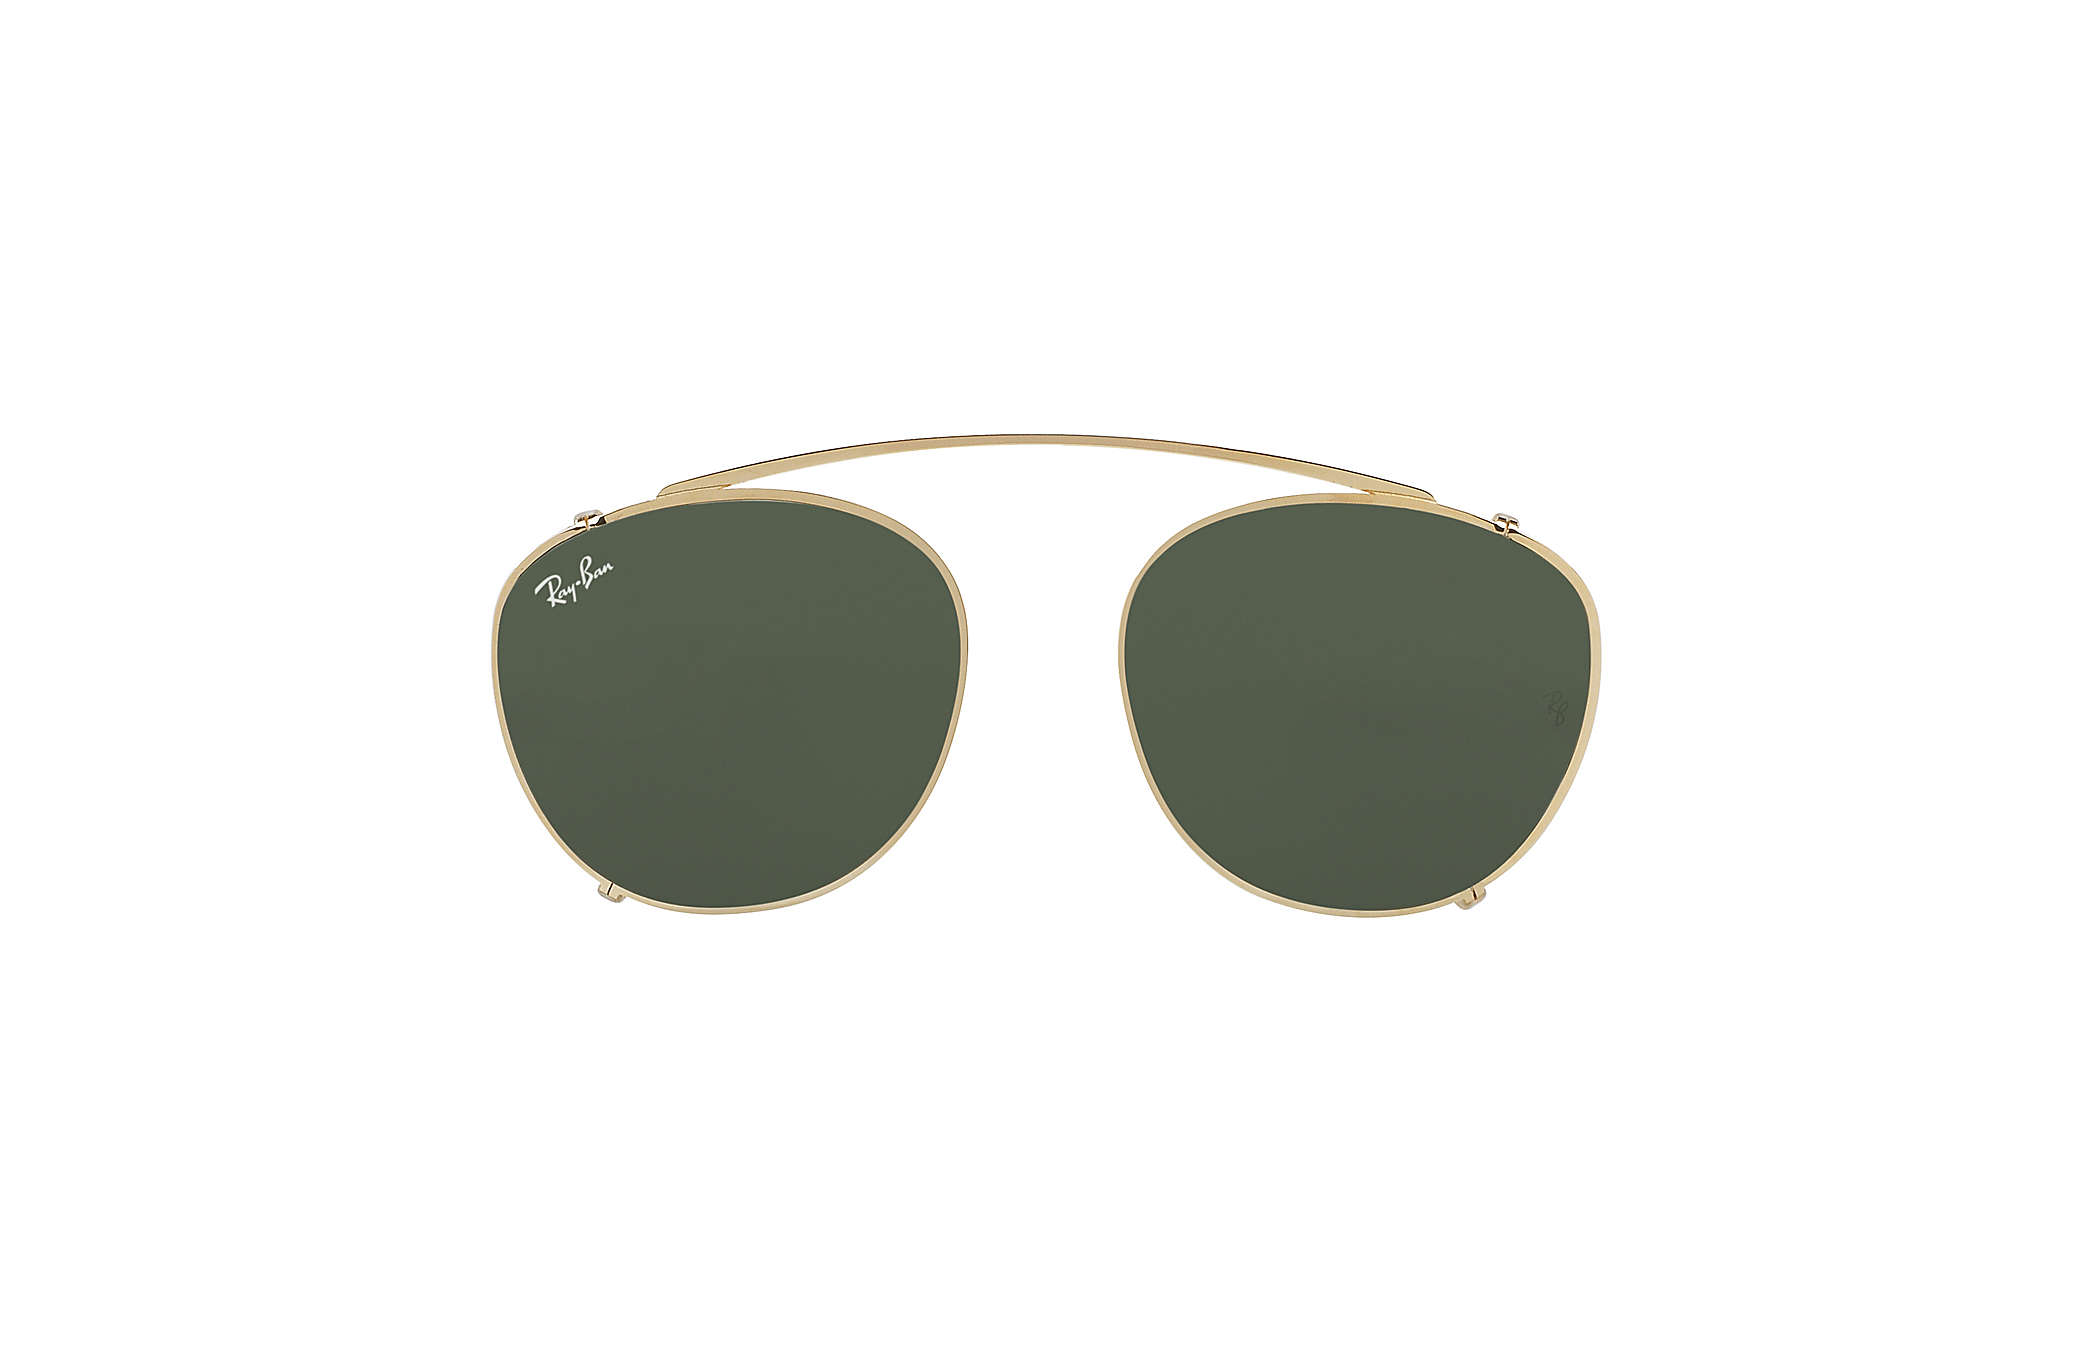 55f5220f55 Ray-Ban prescription glasses RB6355 Gunmetal - Liteforce ...